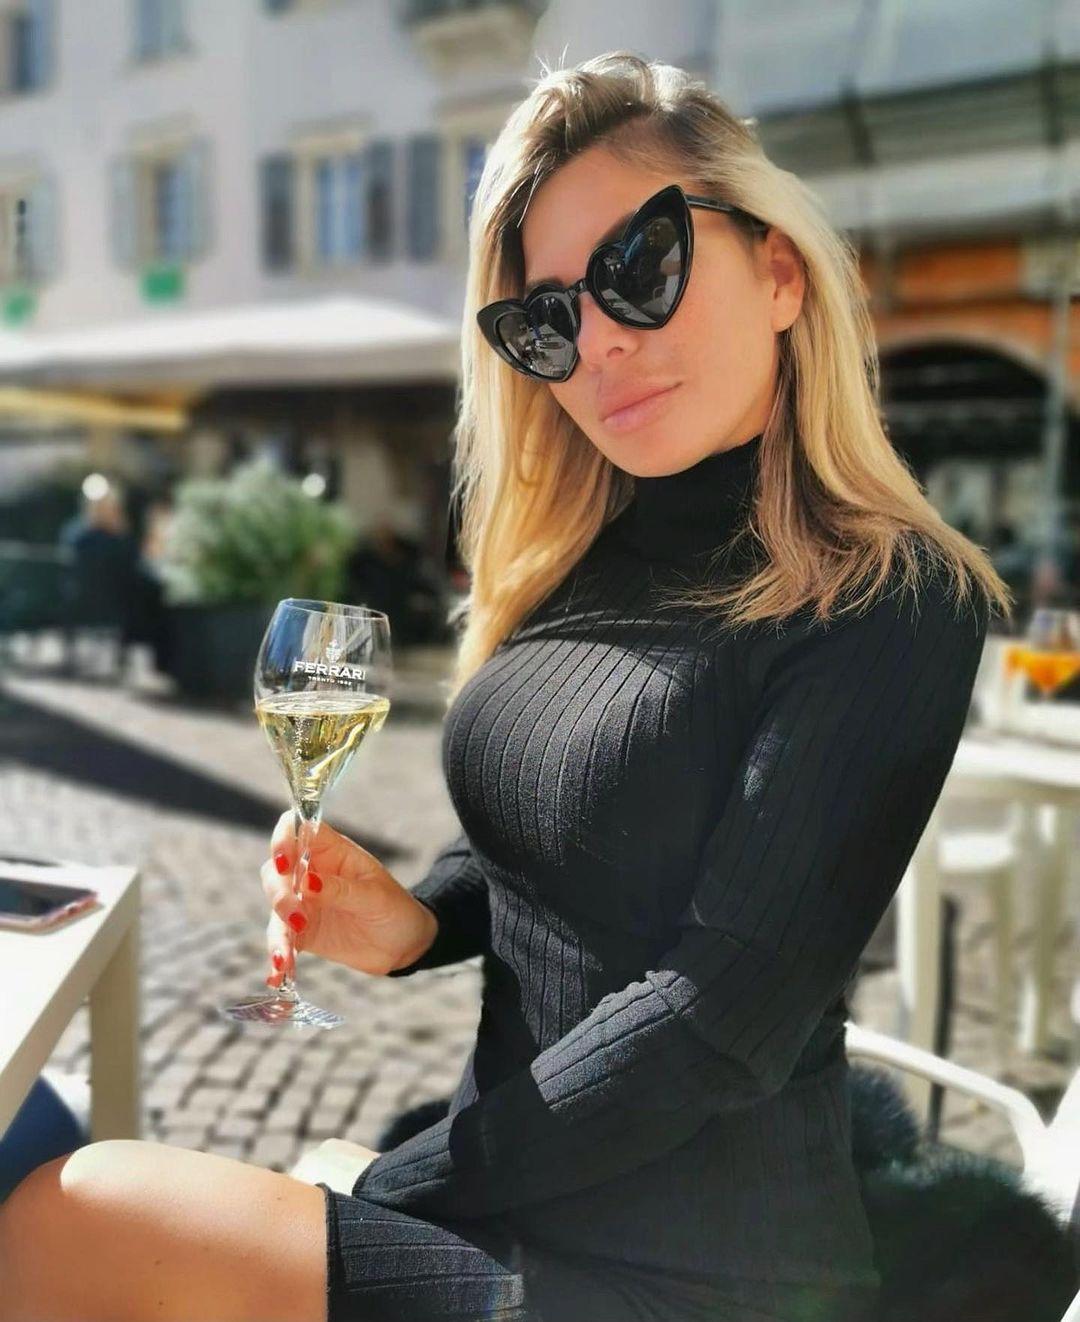 Alessandra-Moro-Wallpapers-Insta-Fit-Bio-7